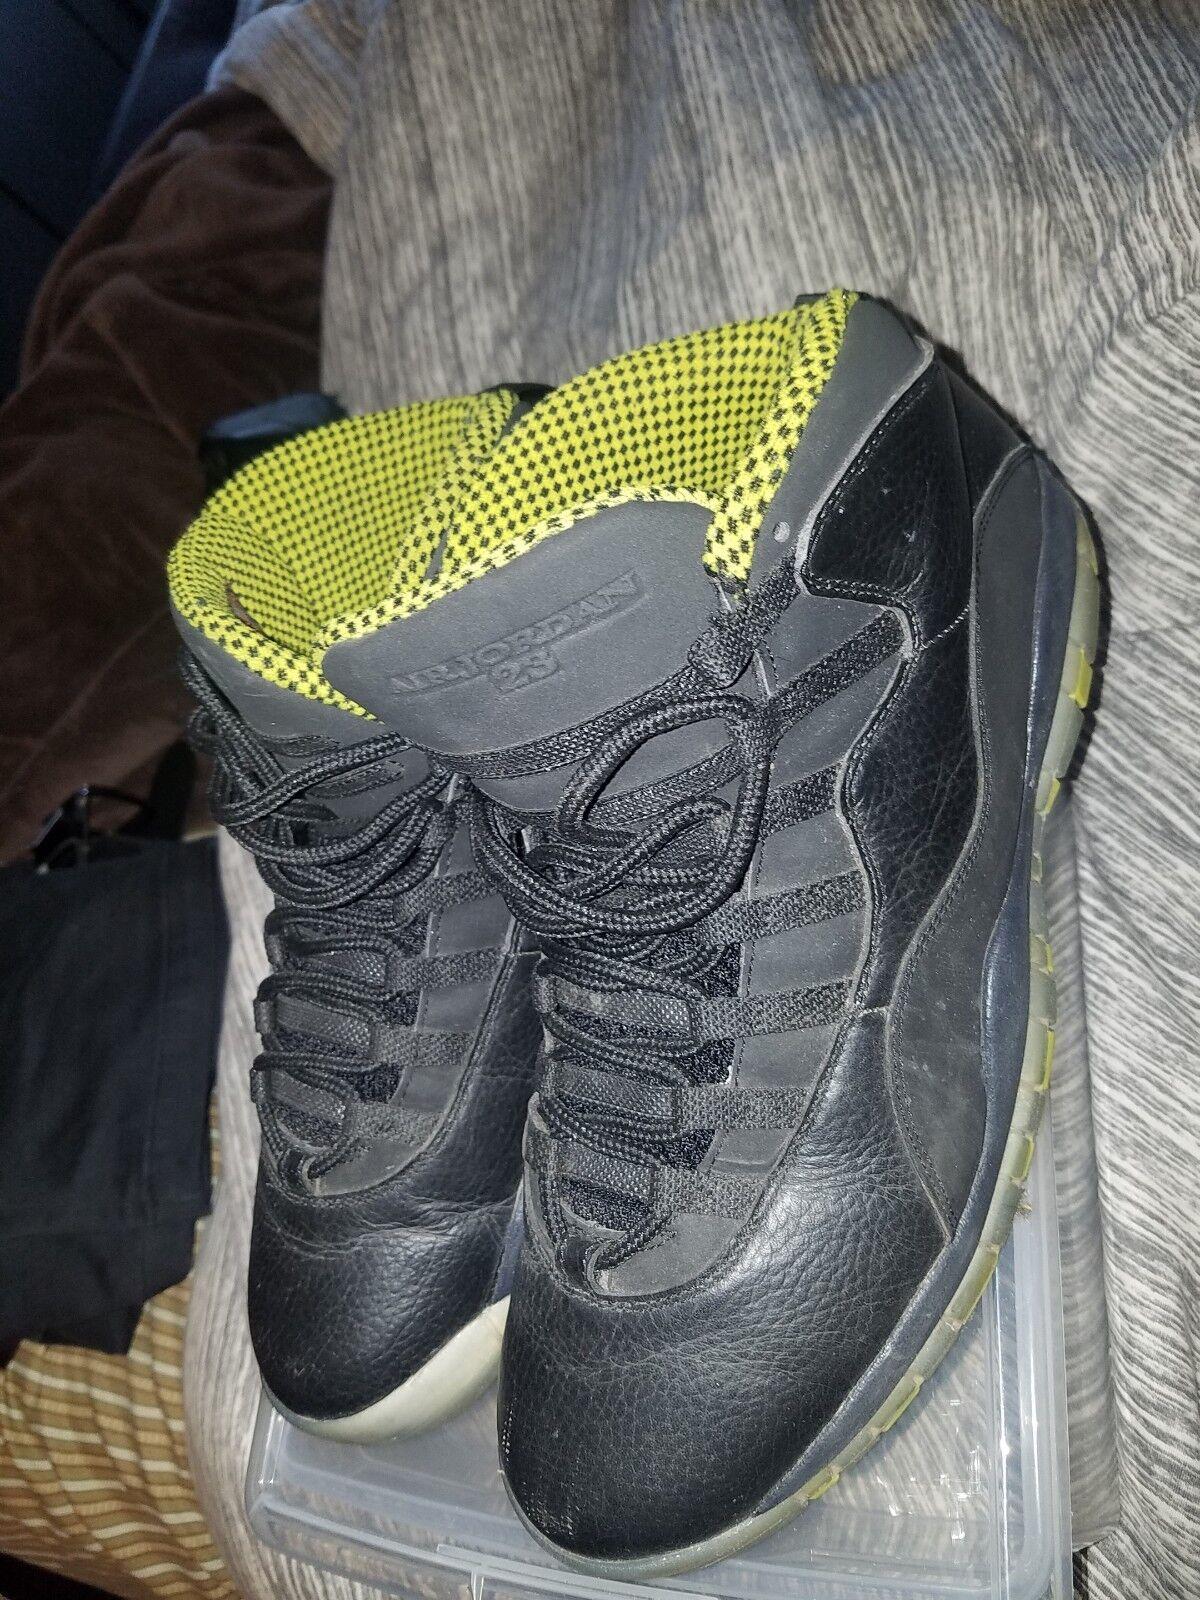 jordan 10 venom green size 12 Wild casual shoes